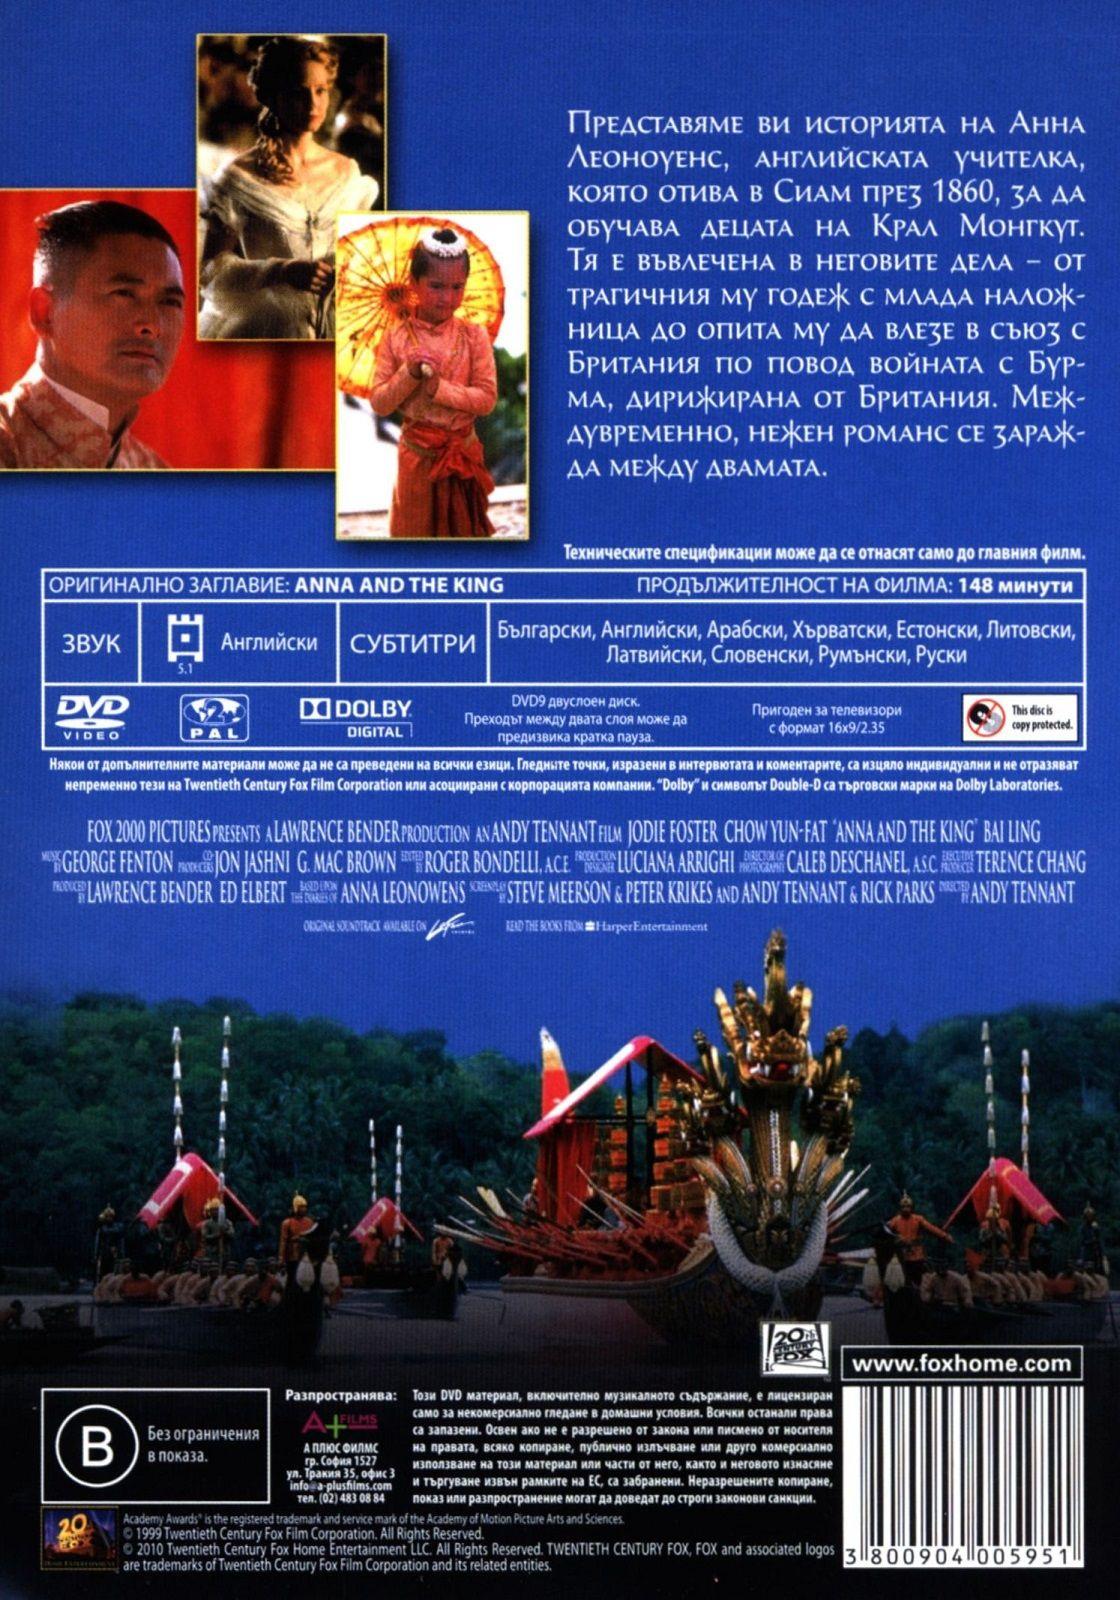 Анна и кралят (DVD) - 2